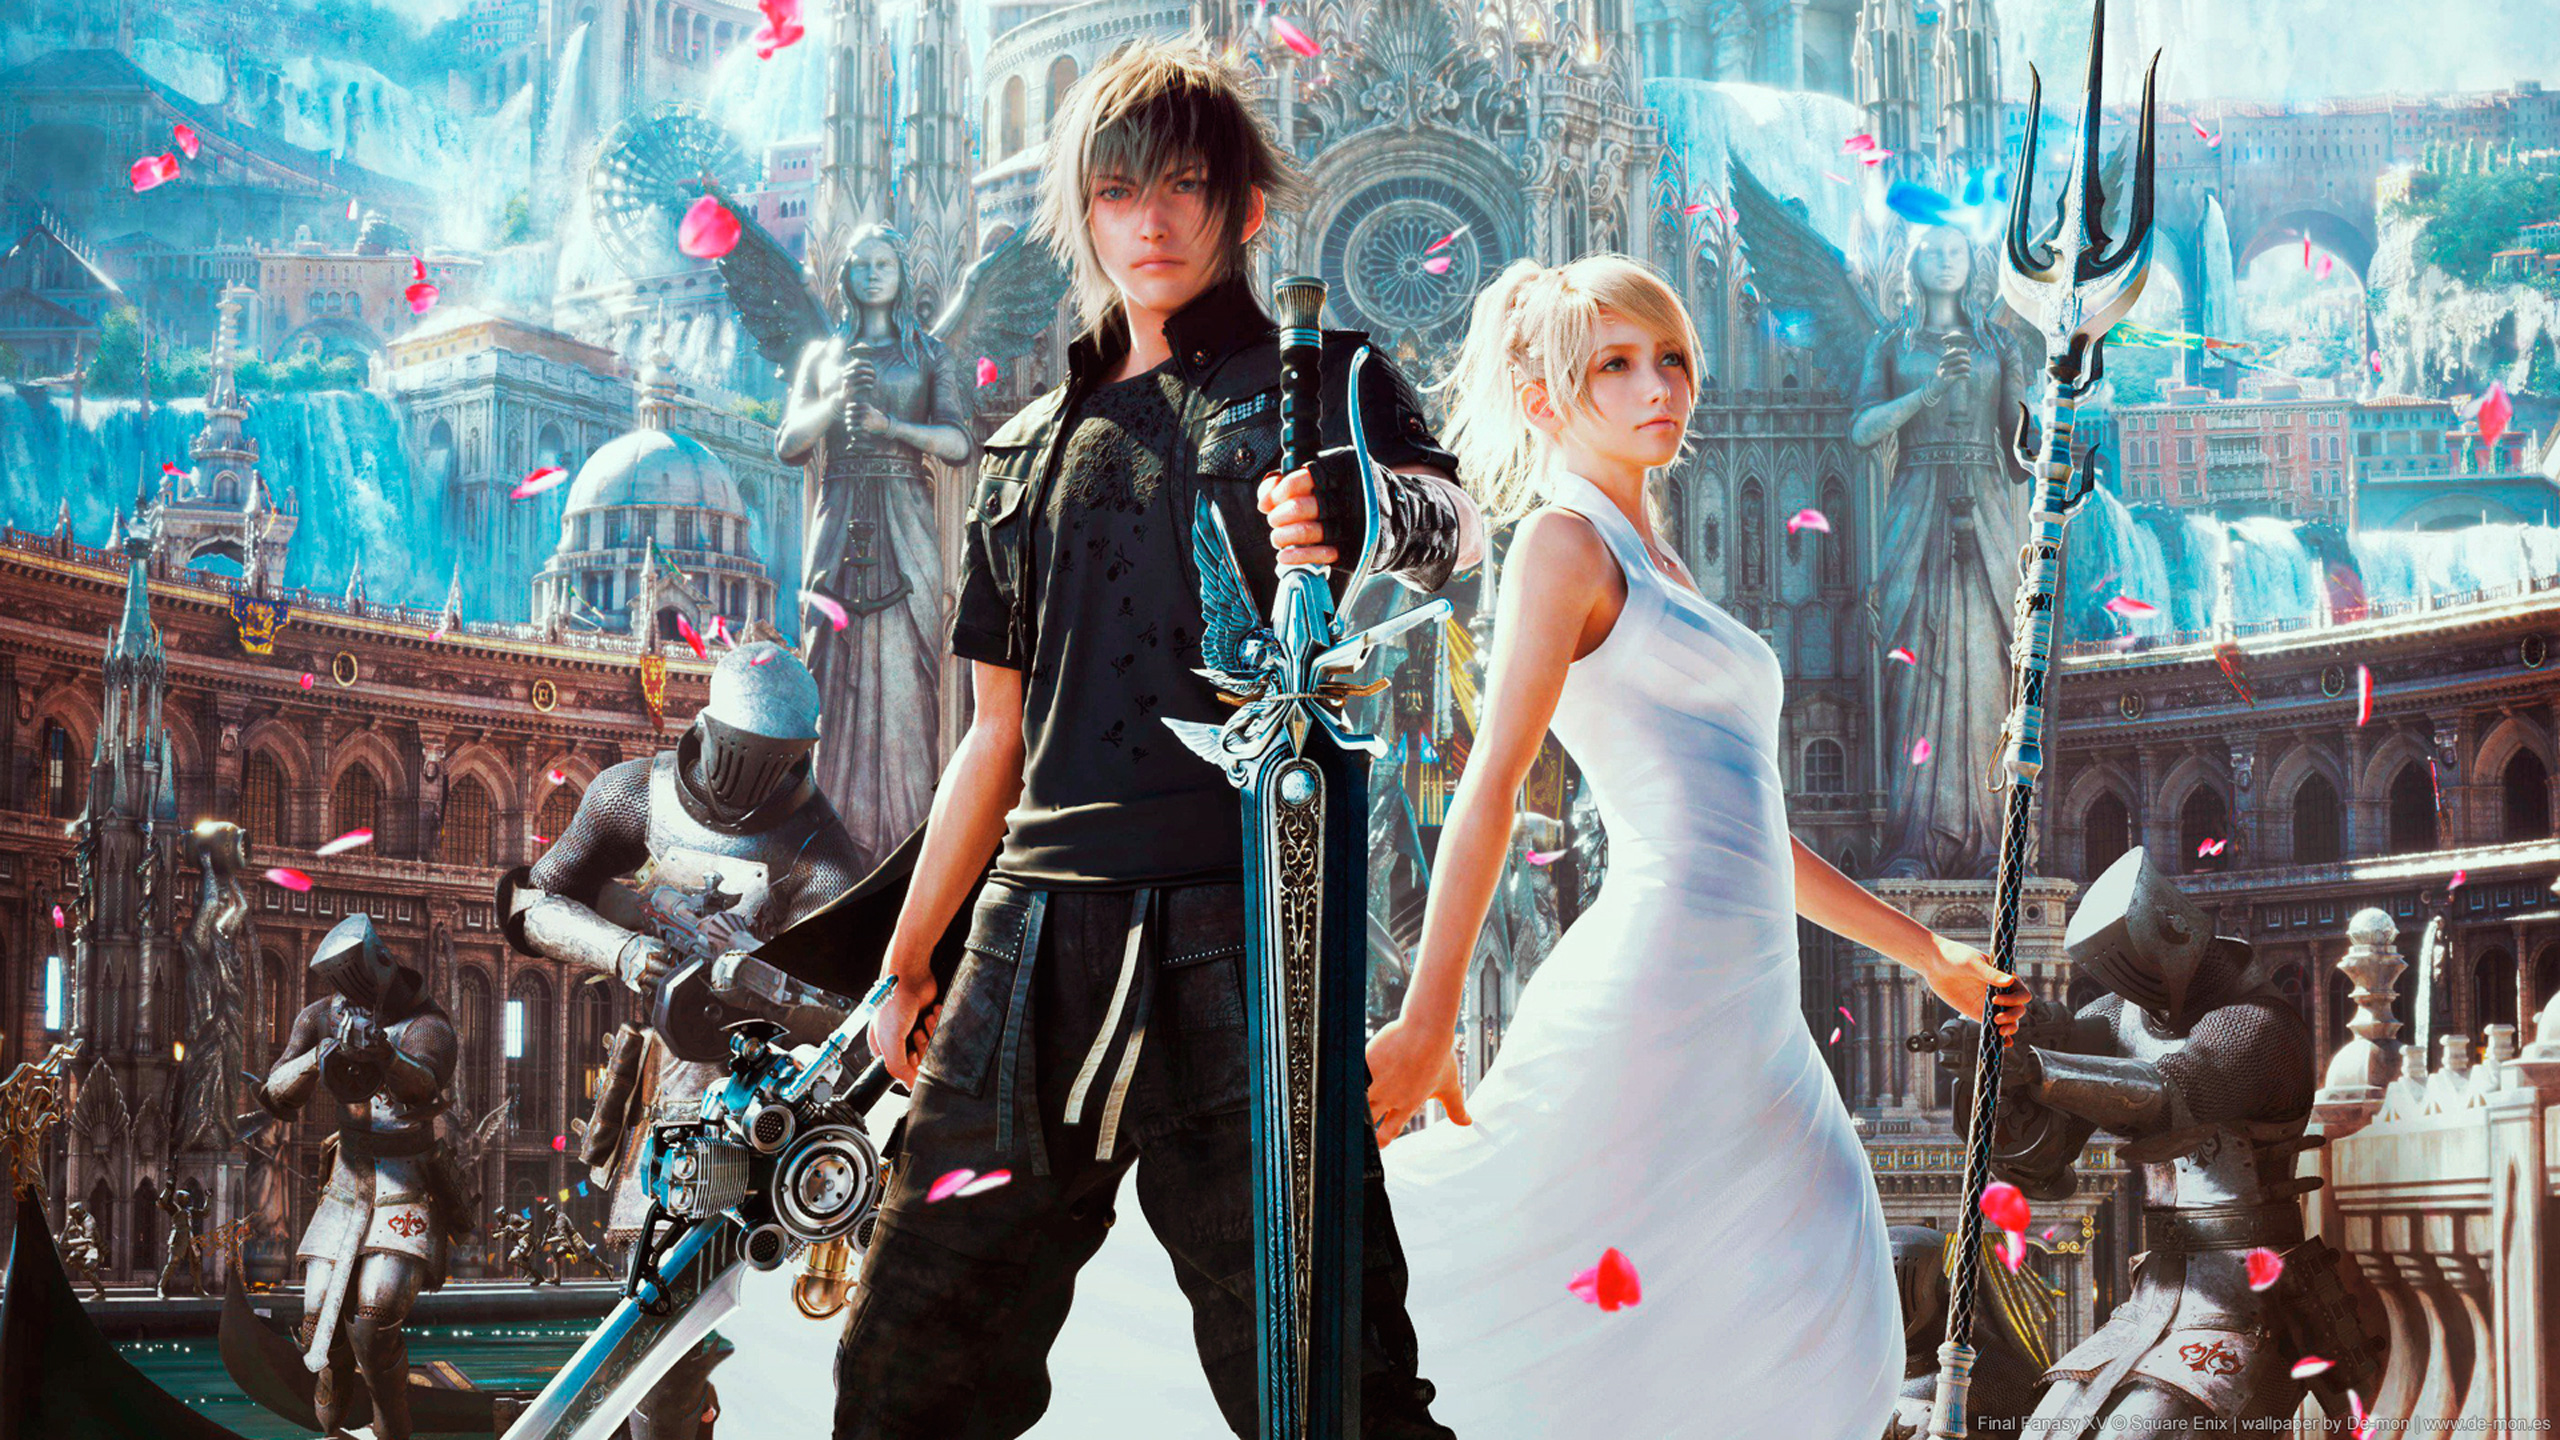 final-fantasy-xv-artwork-h5.jpg